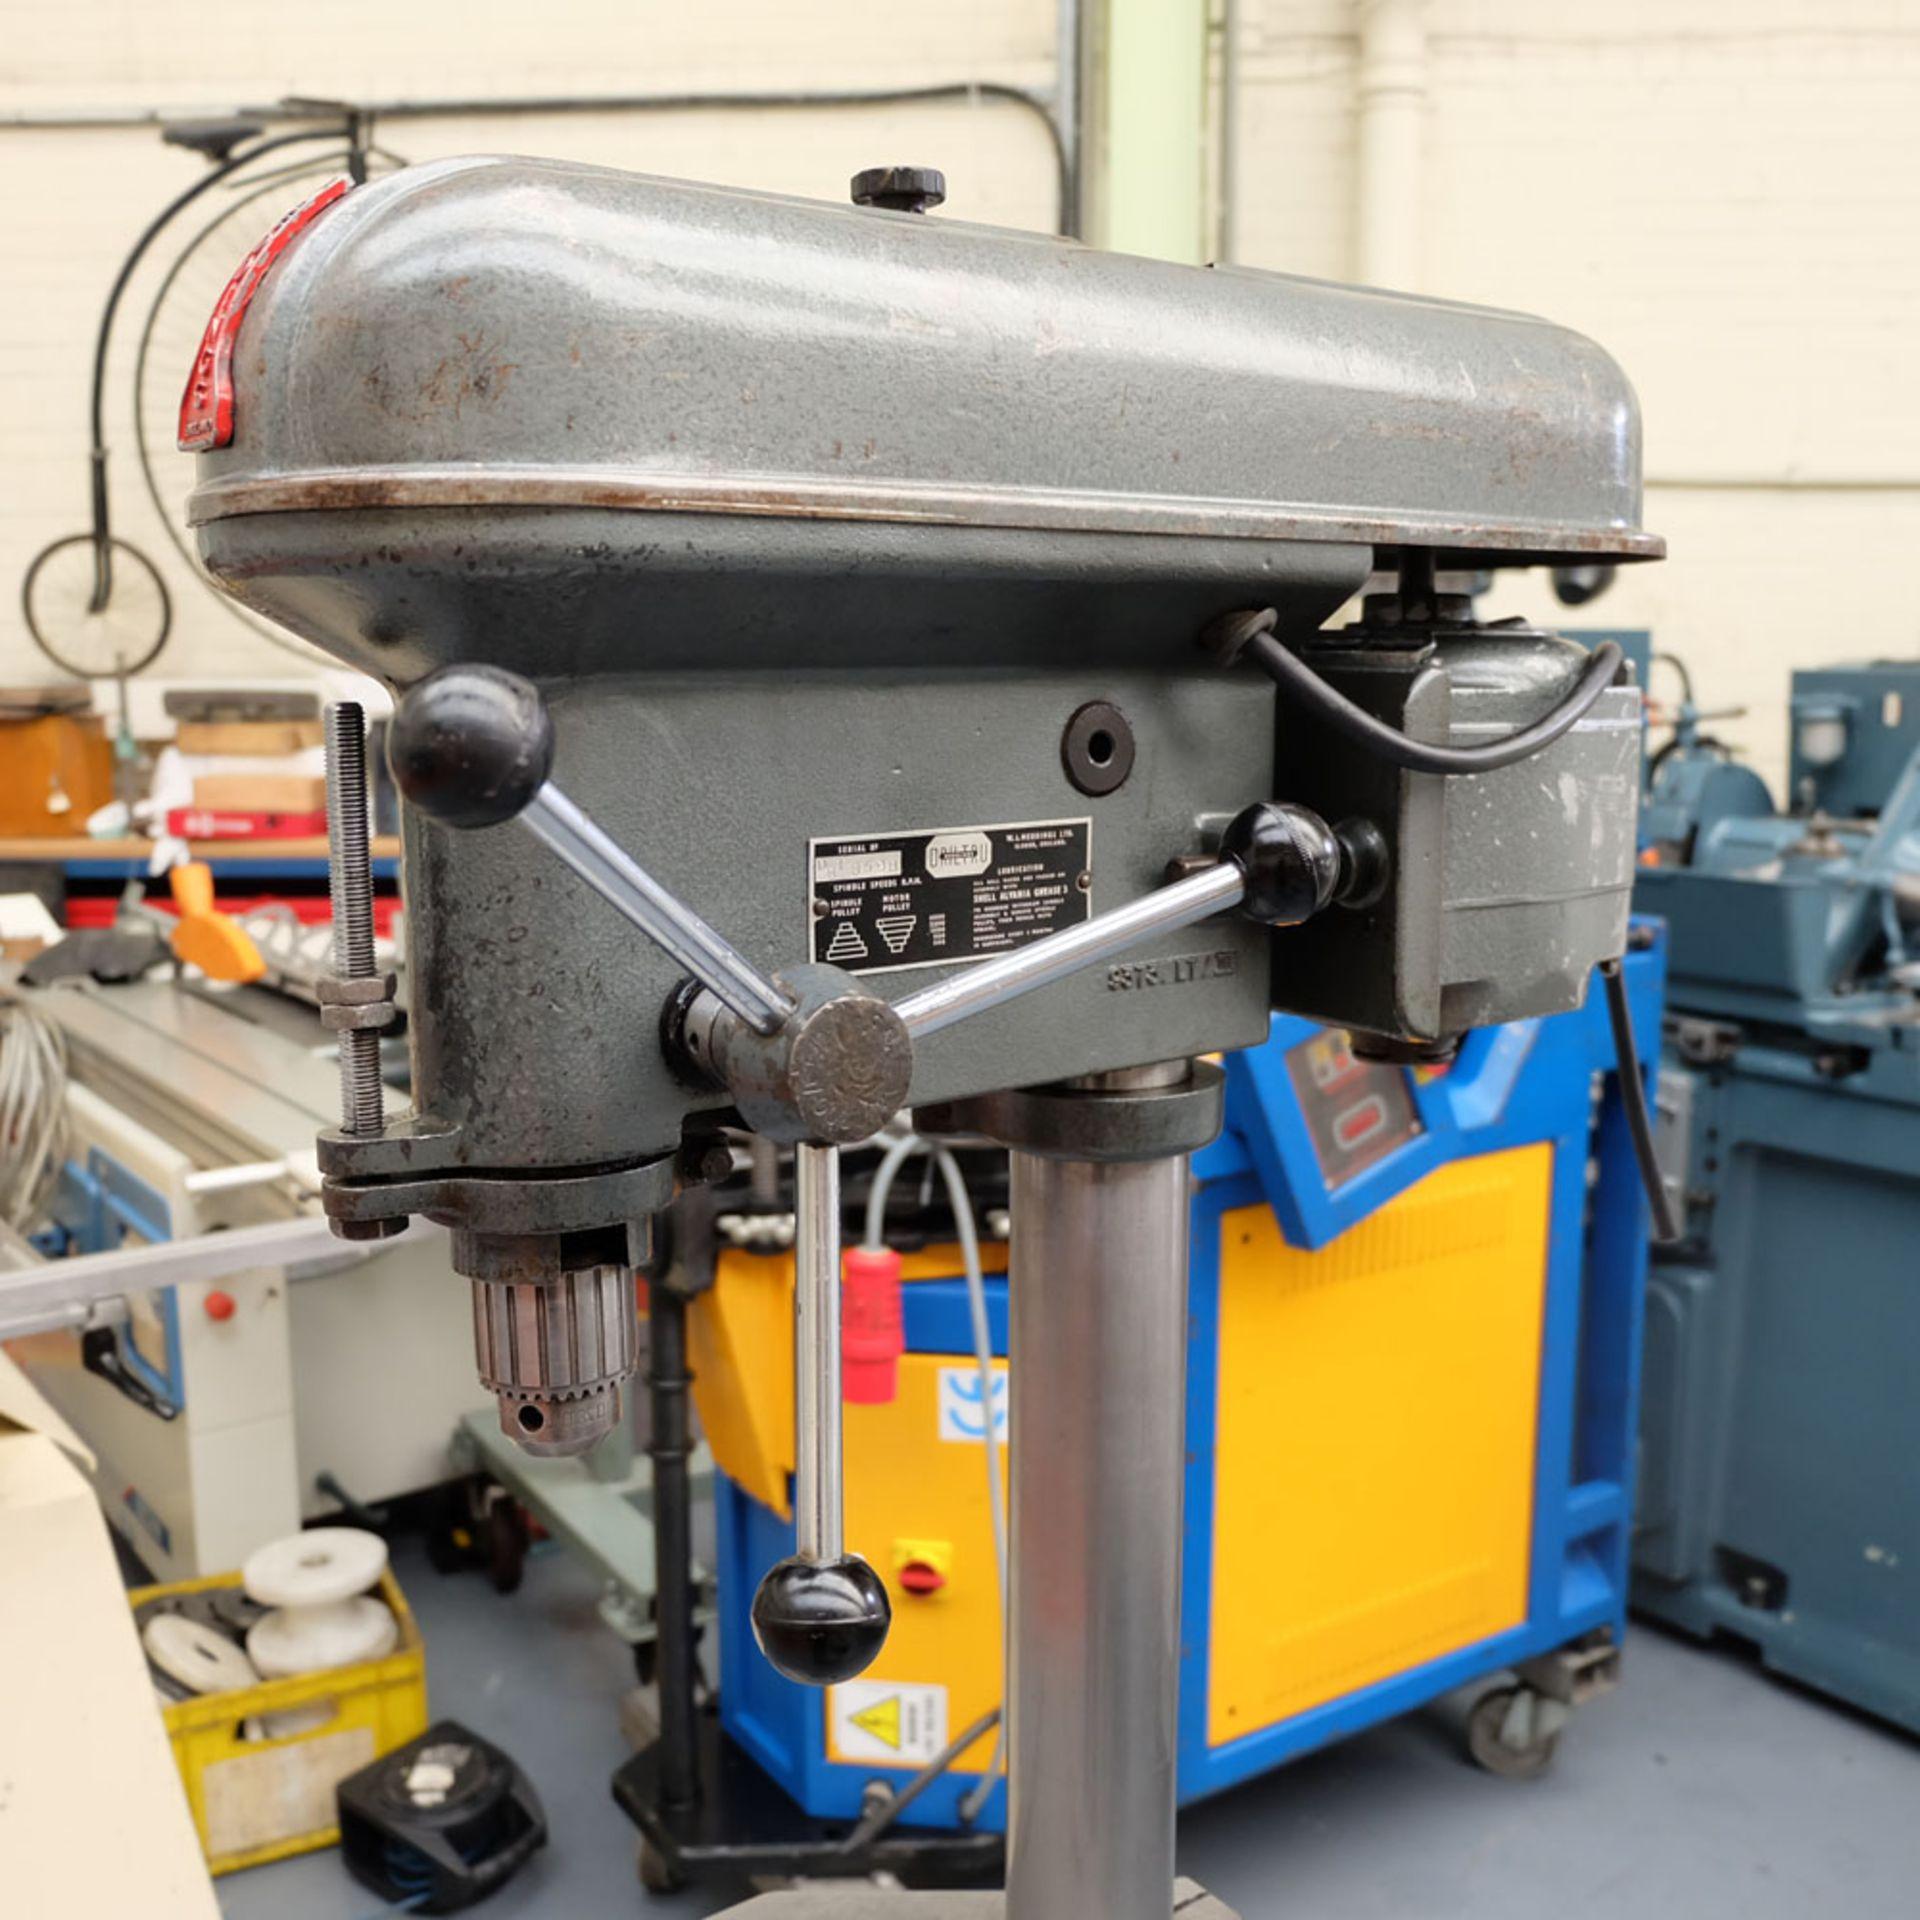 "Meddings Type Driltru Pillar Drill. Capacity 1/2"". 5 Speeds 500 - 4000rpm. - Image 2 of 7"